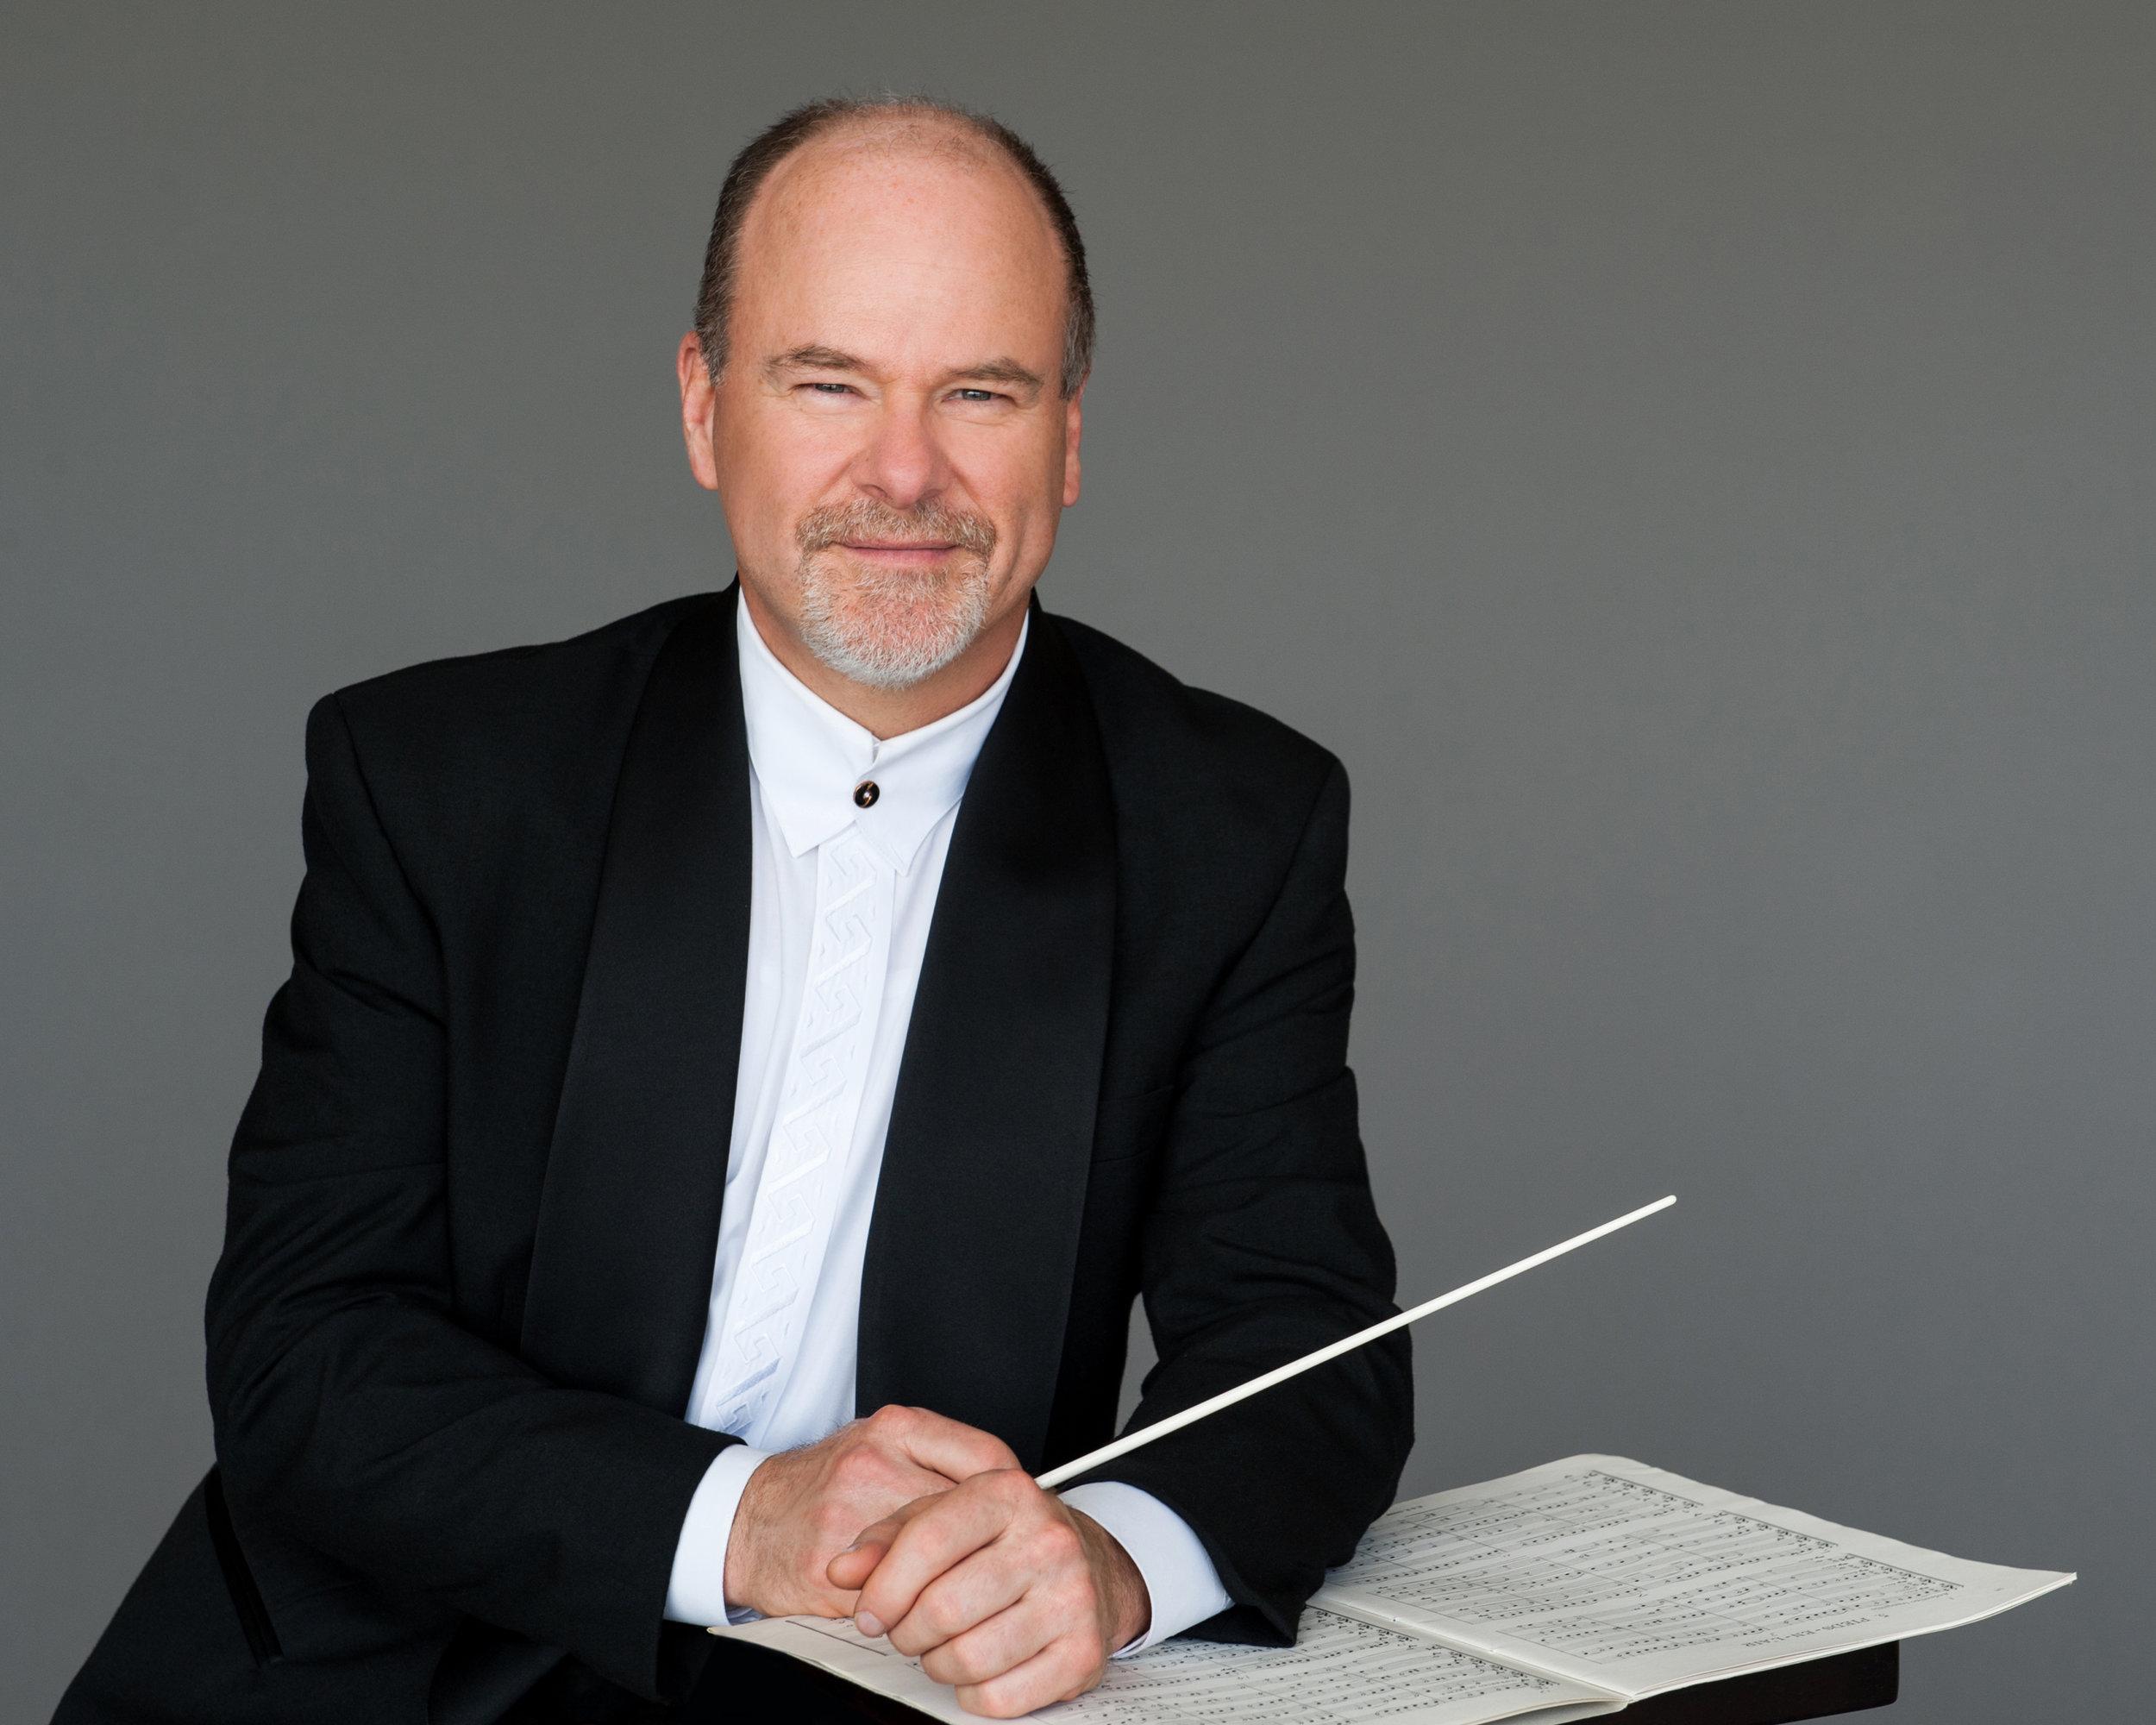 Maestro John Kraus